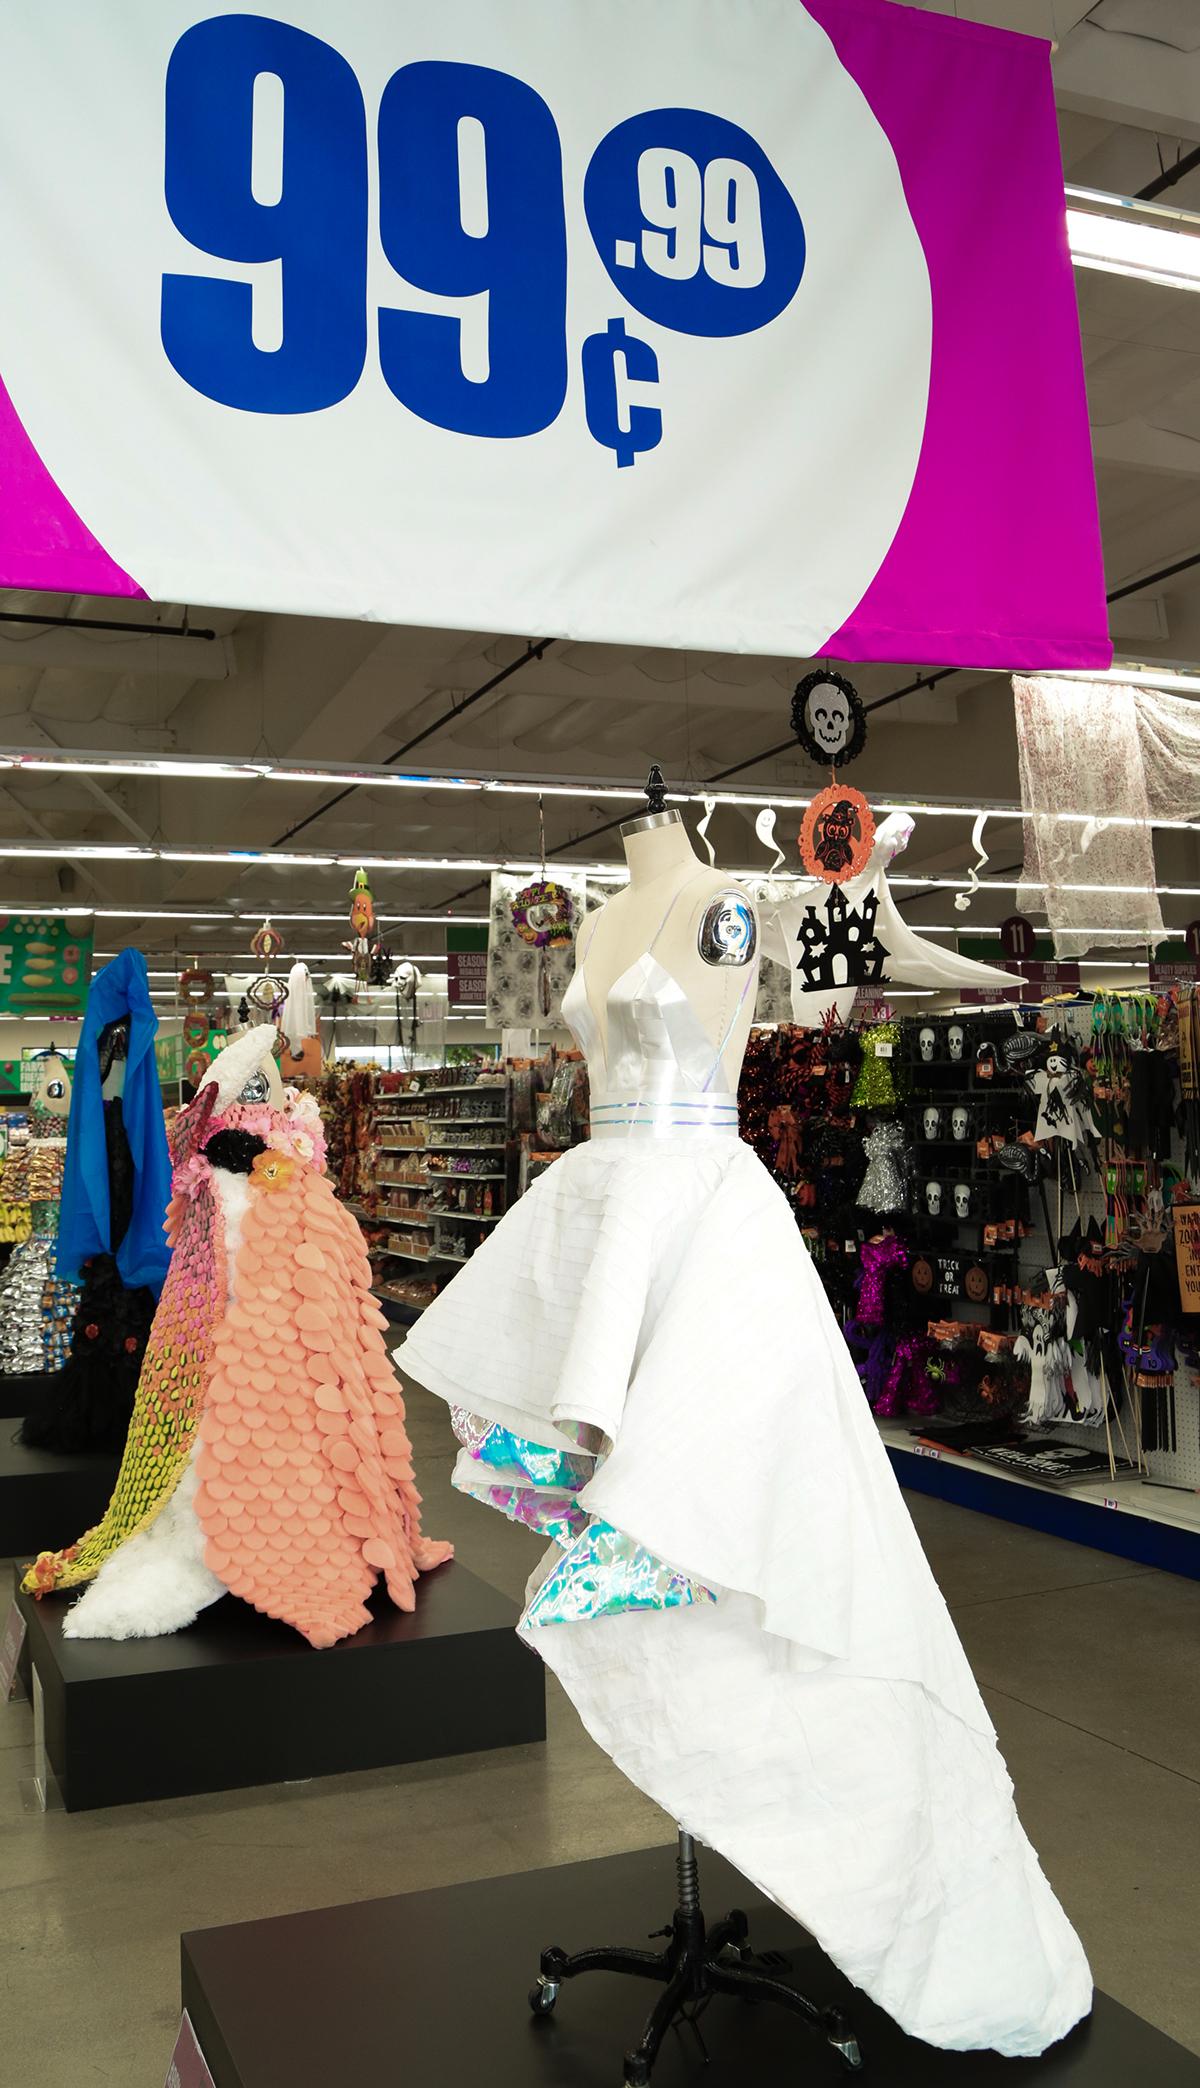 99 Cents Only Store FIDM Design Challenge On Portfolio Gallery